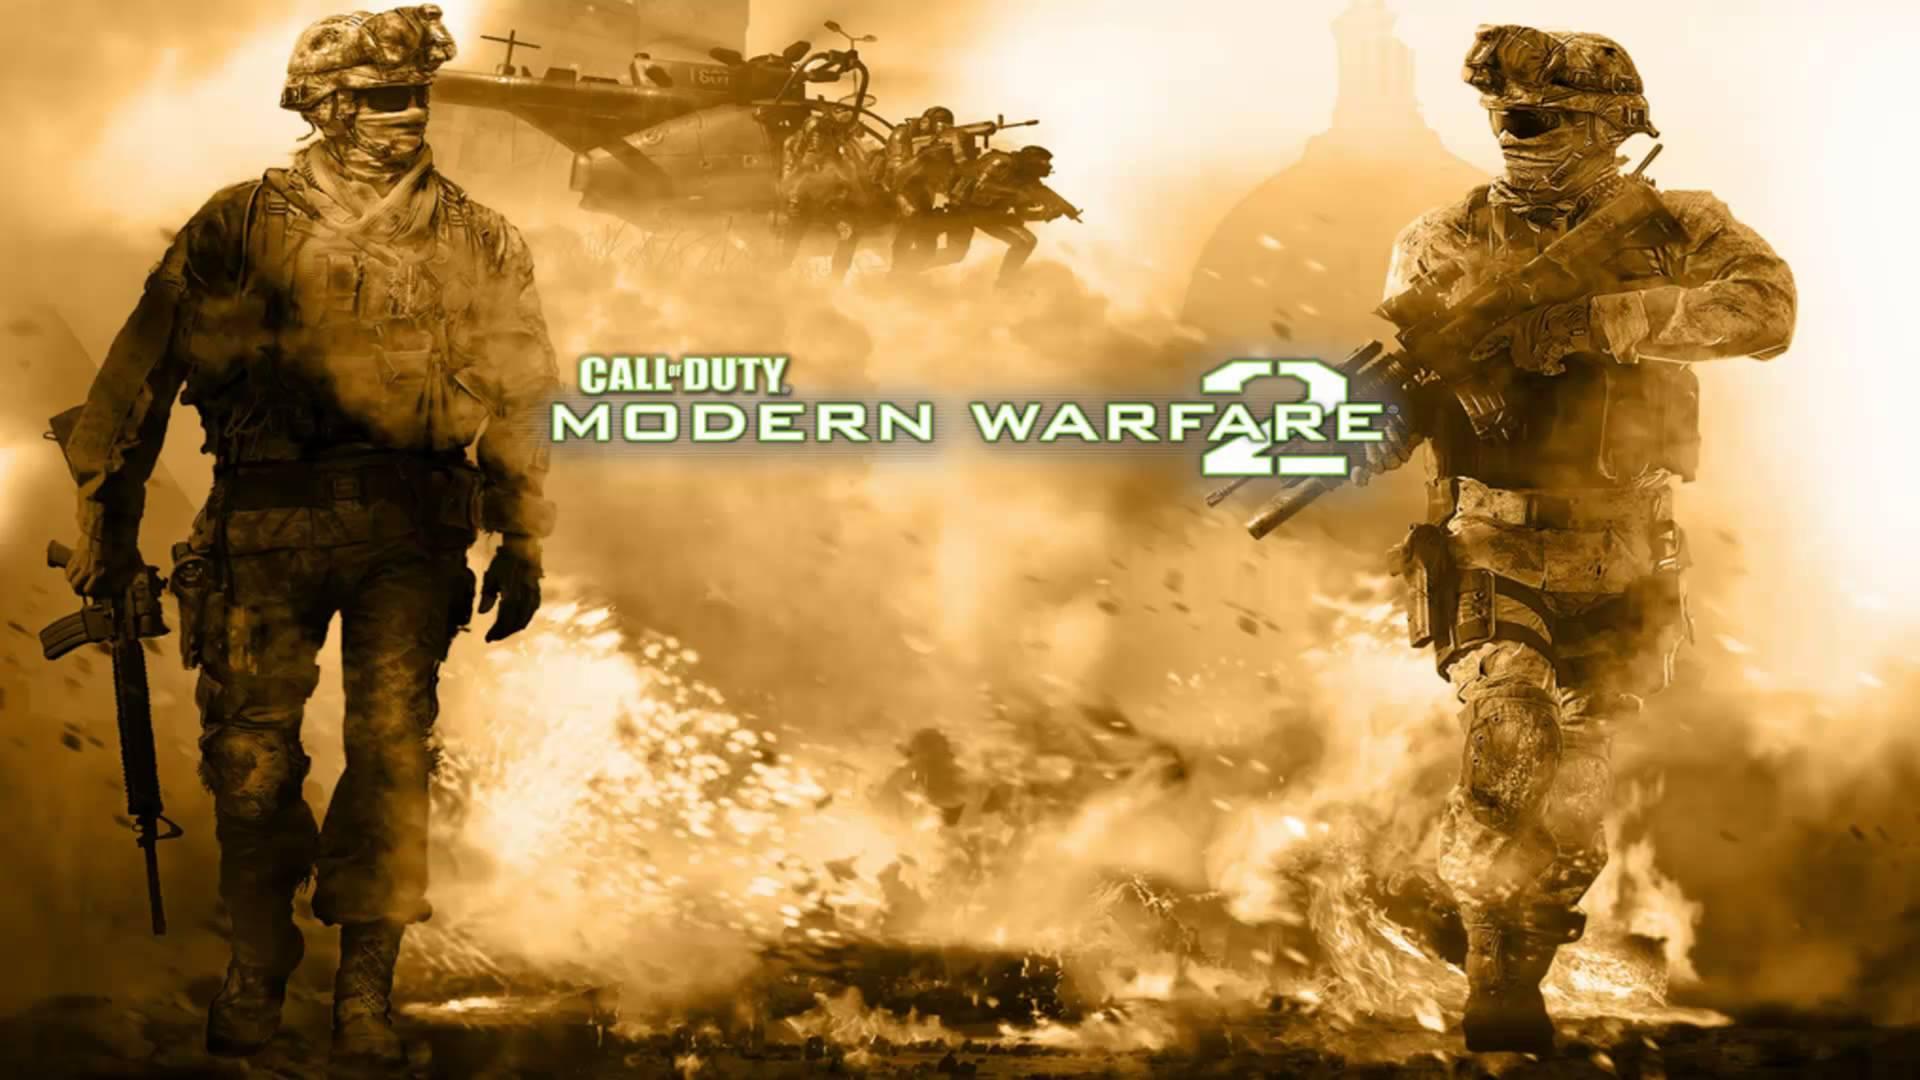 Call of duty modern warfare 2 wallpapers wallpaper cave - Call of duty warfare wallpaper ...